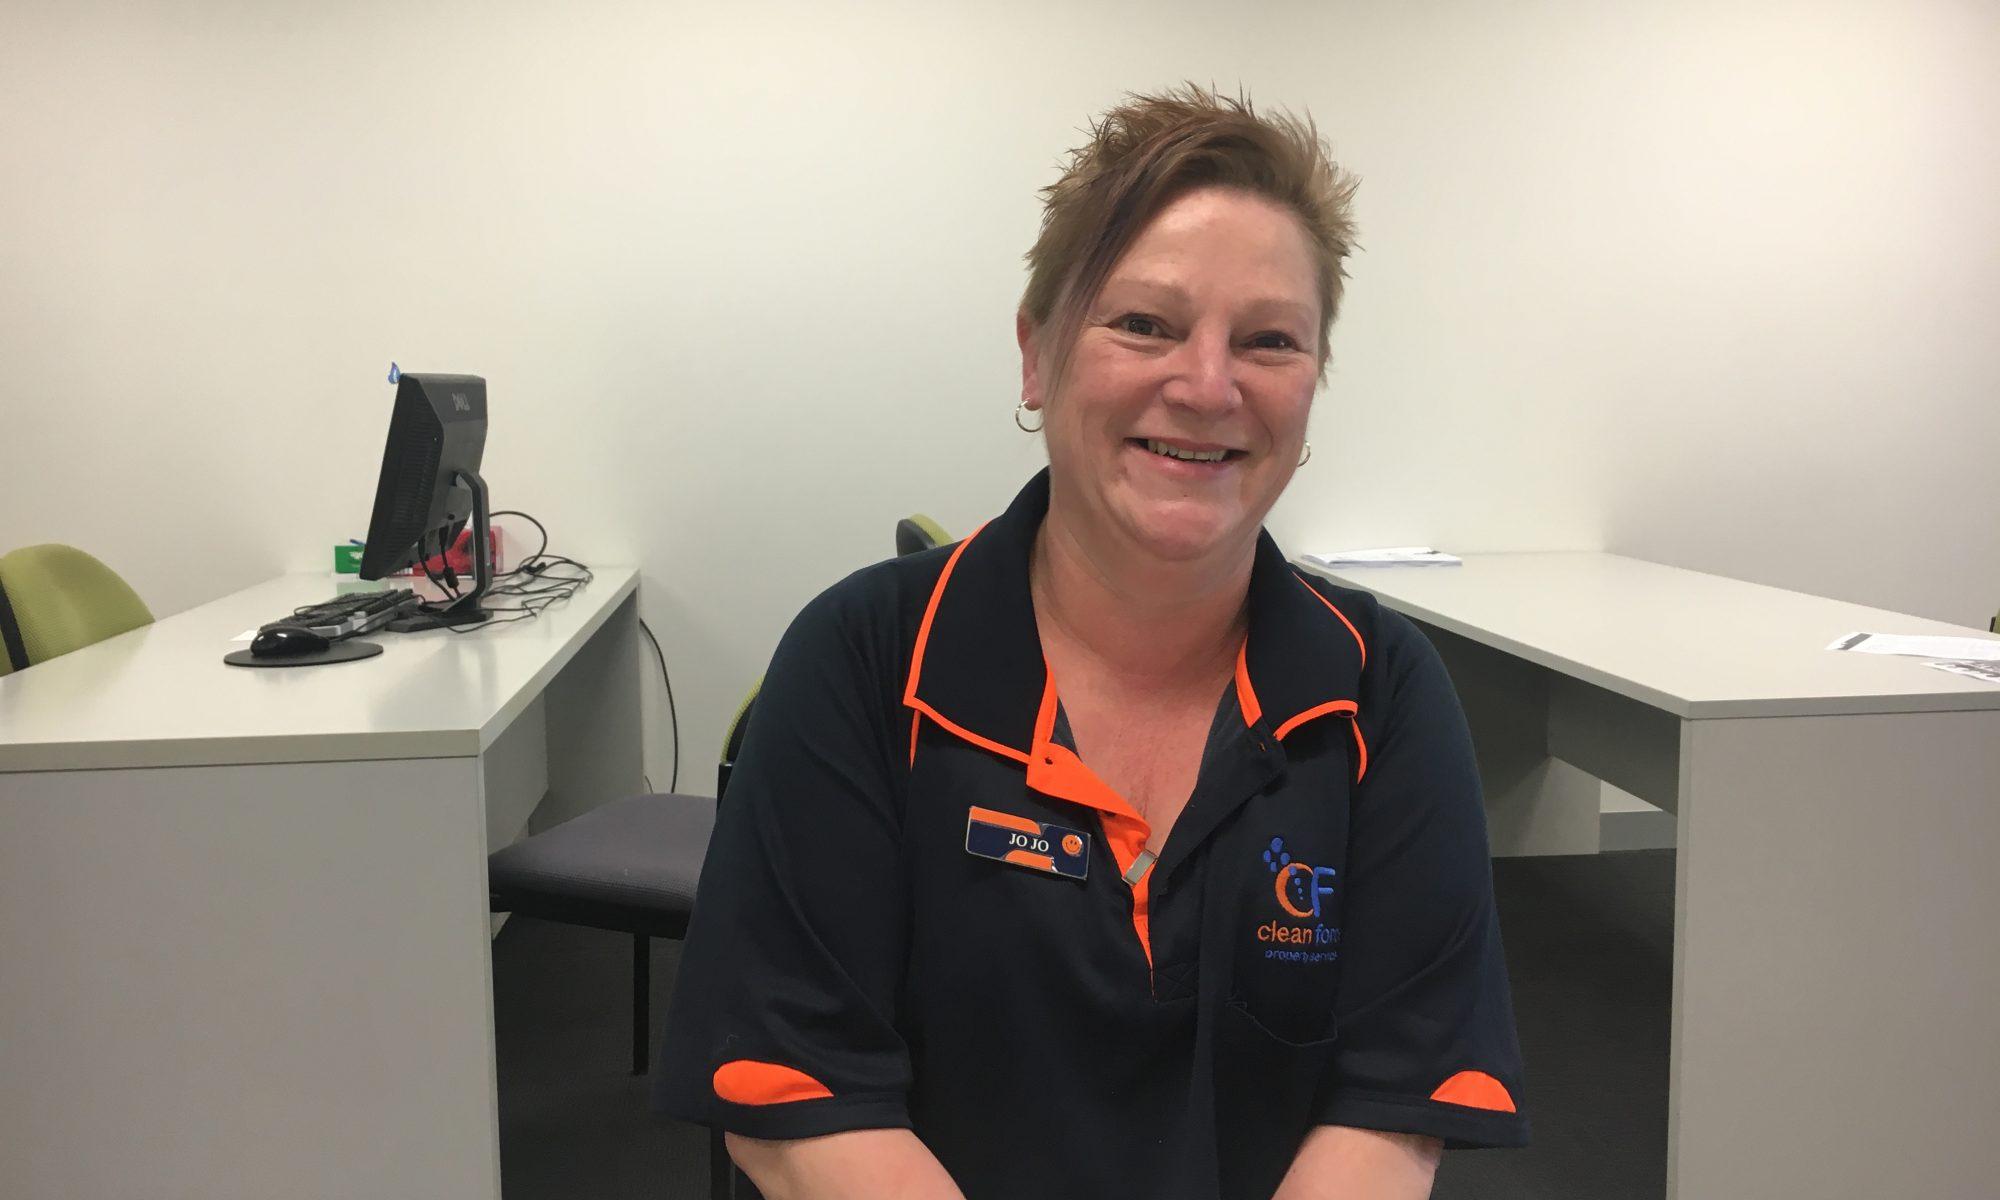 Jojo returns to work, more confident than ever